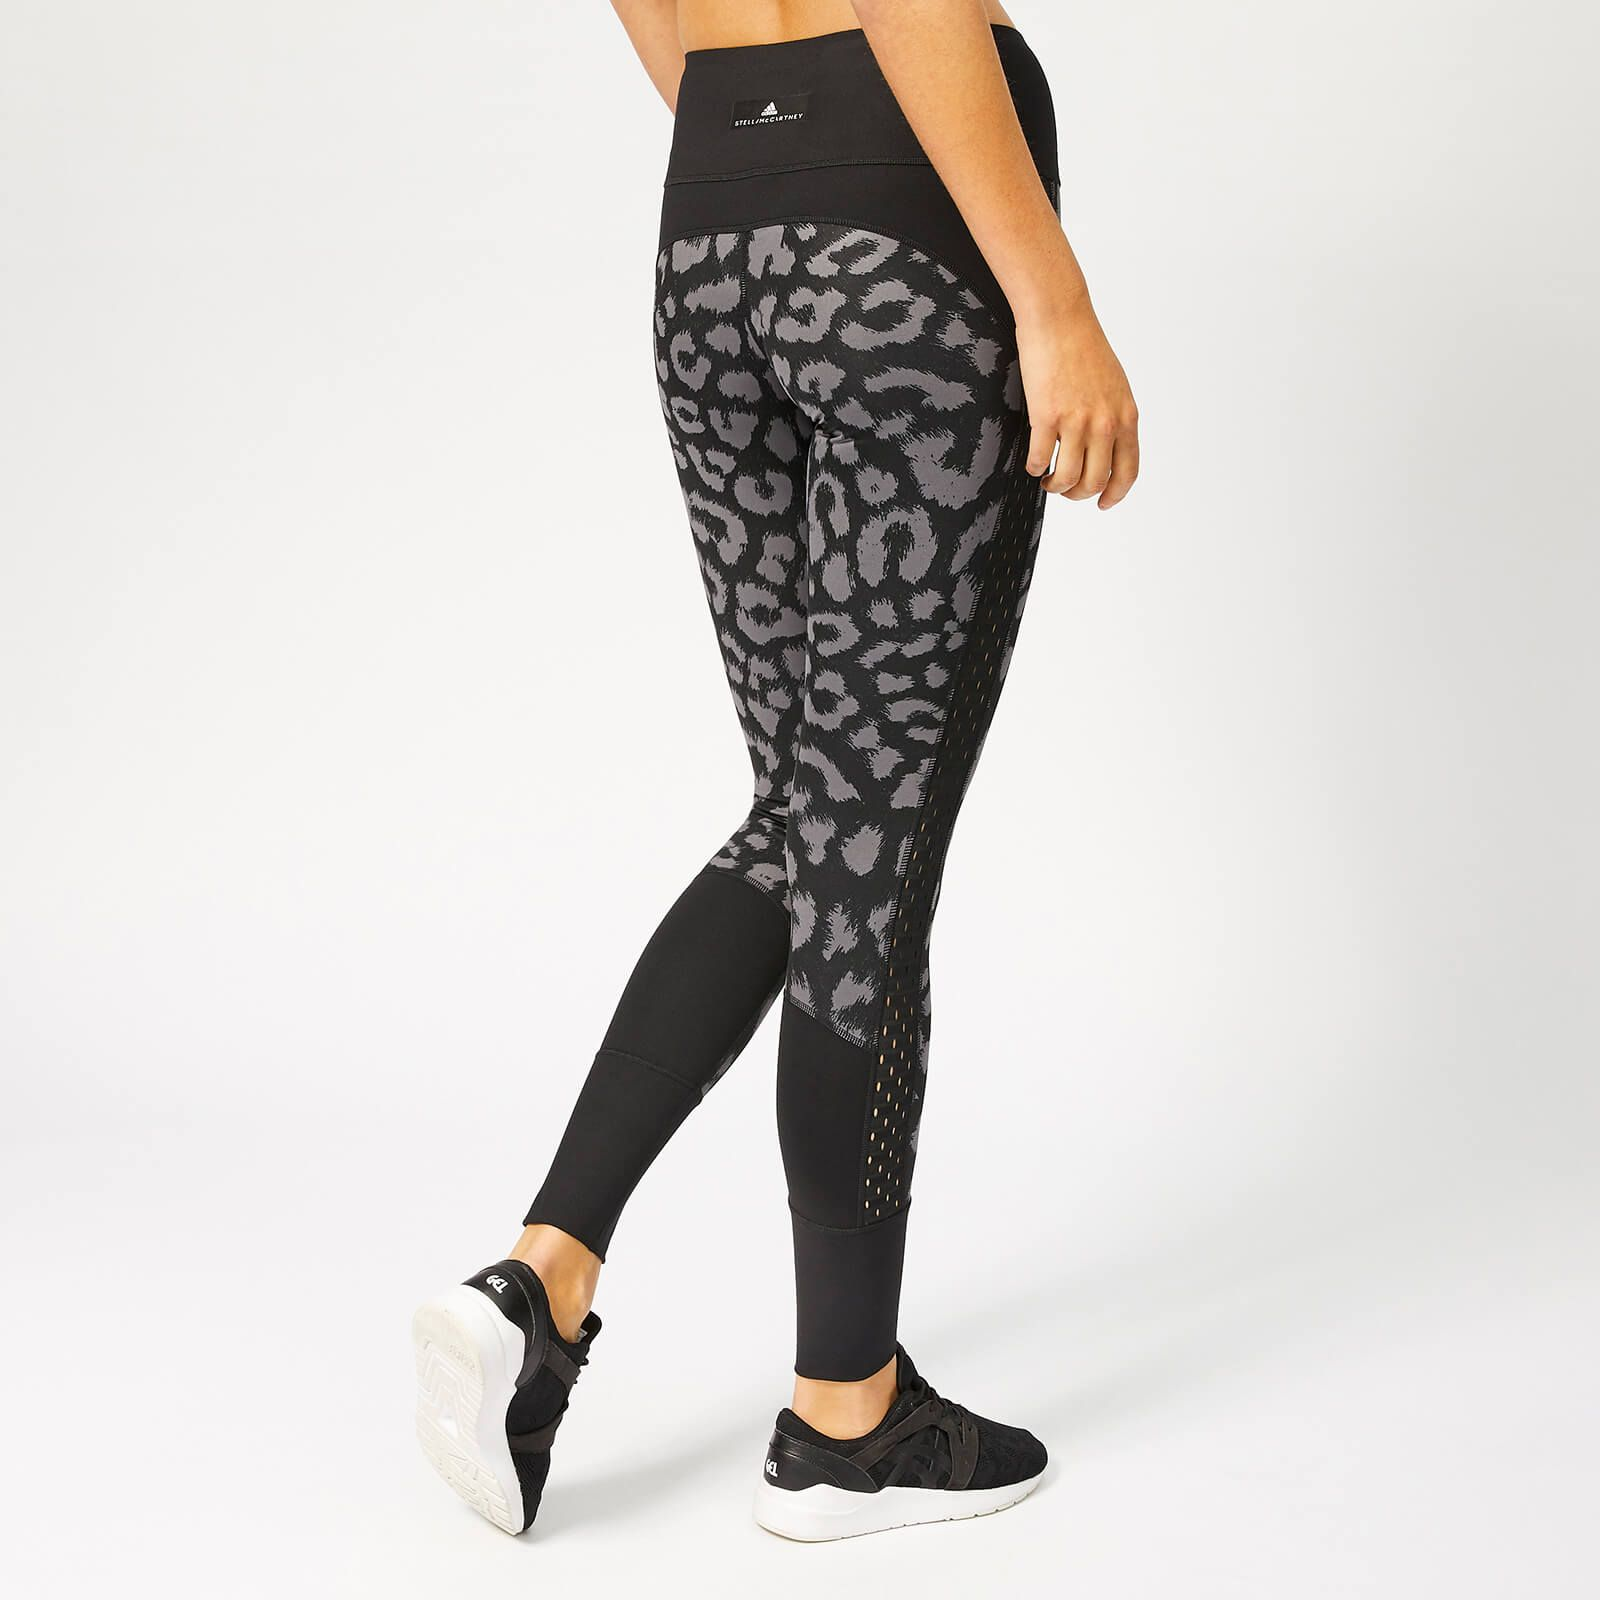 538d5949037 adidas by Stella McCartney Women s BT Comfort Tights - Black Granite ...